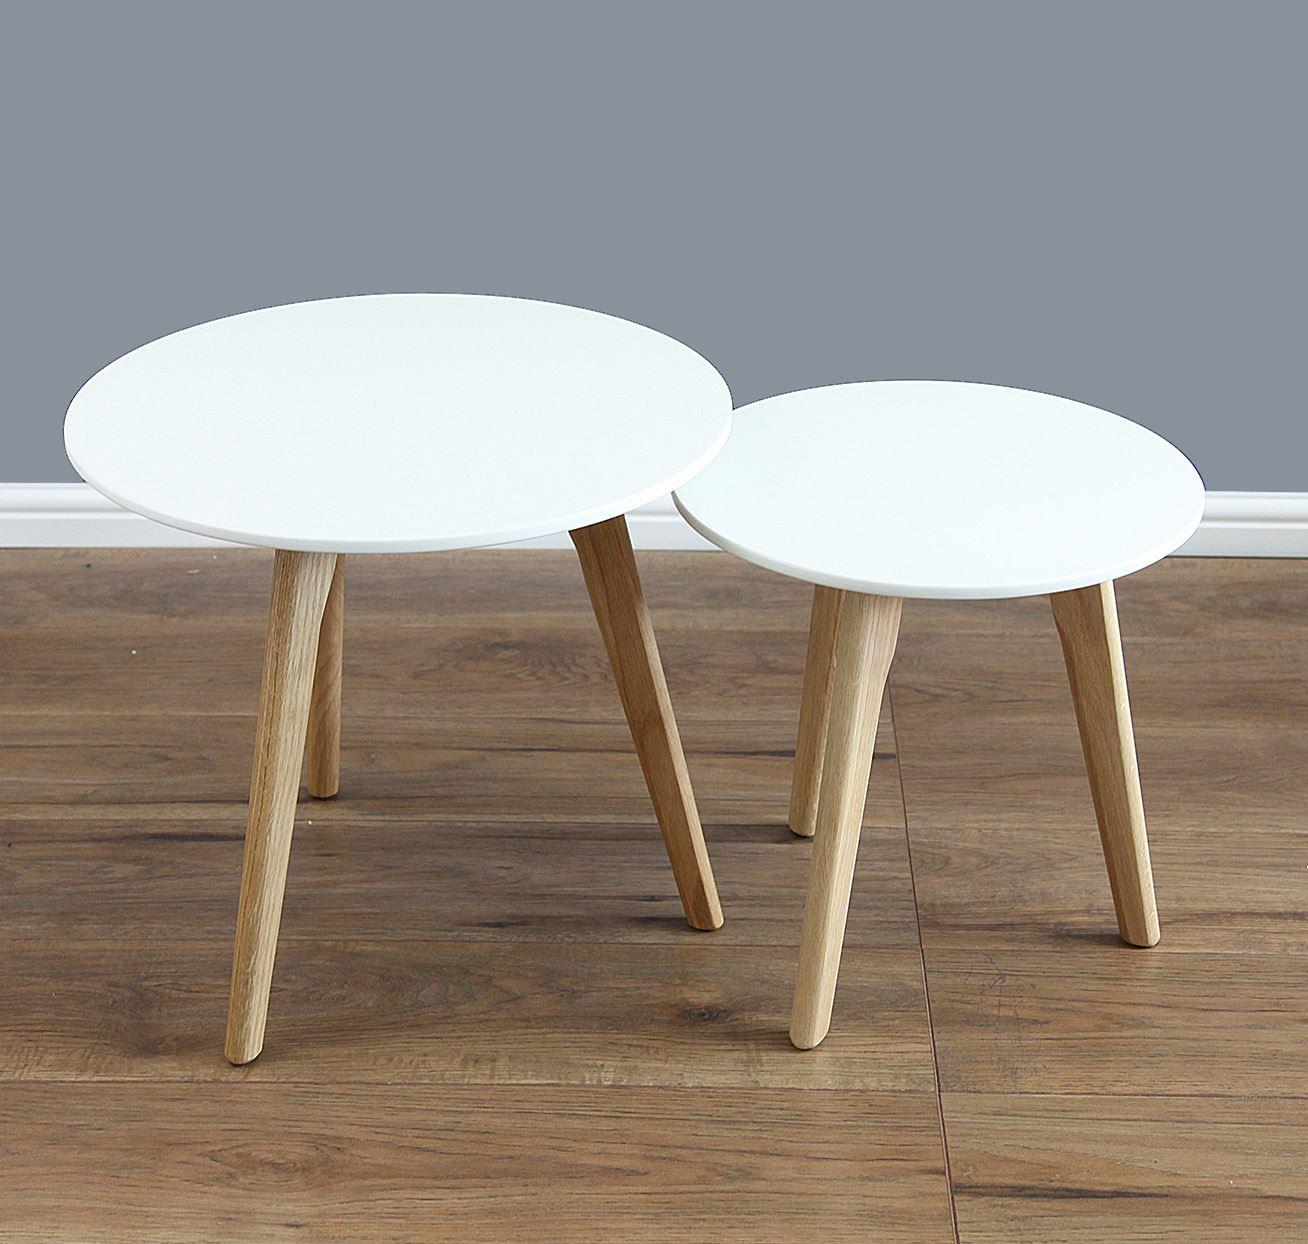 Round Coffee Tables On Ebay: Mmilo® SPIO Nest Round Table Set In Pair. Side/Coffee